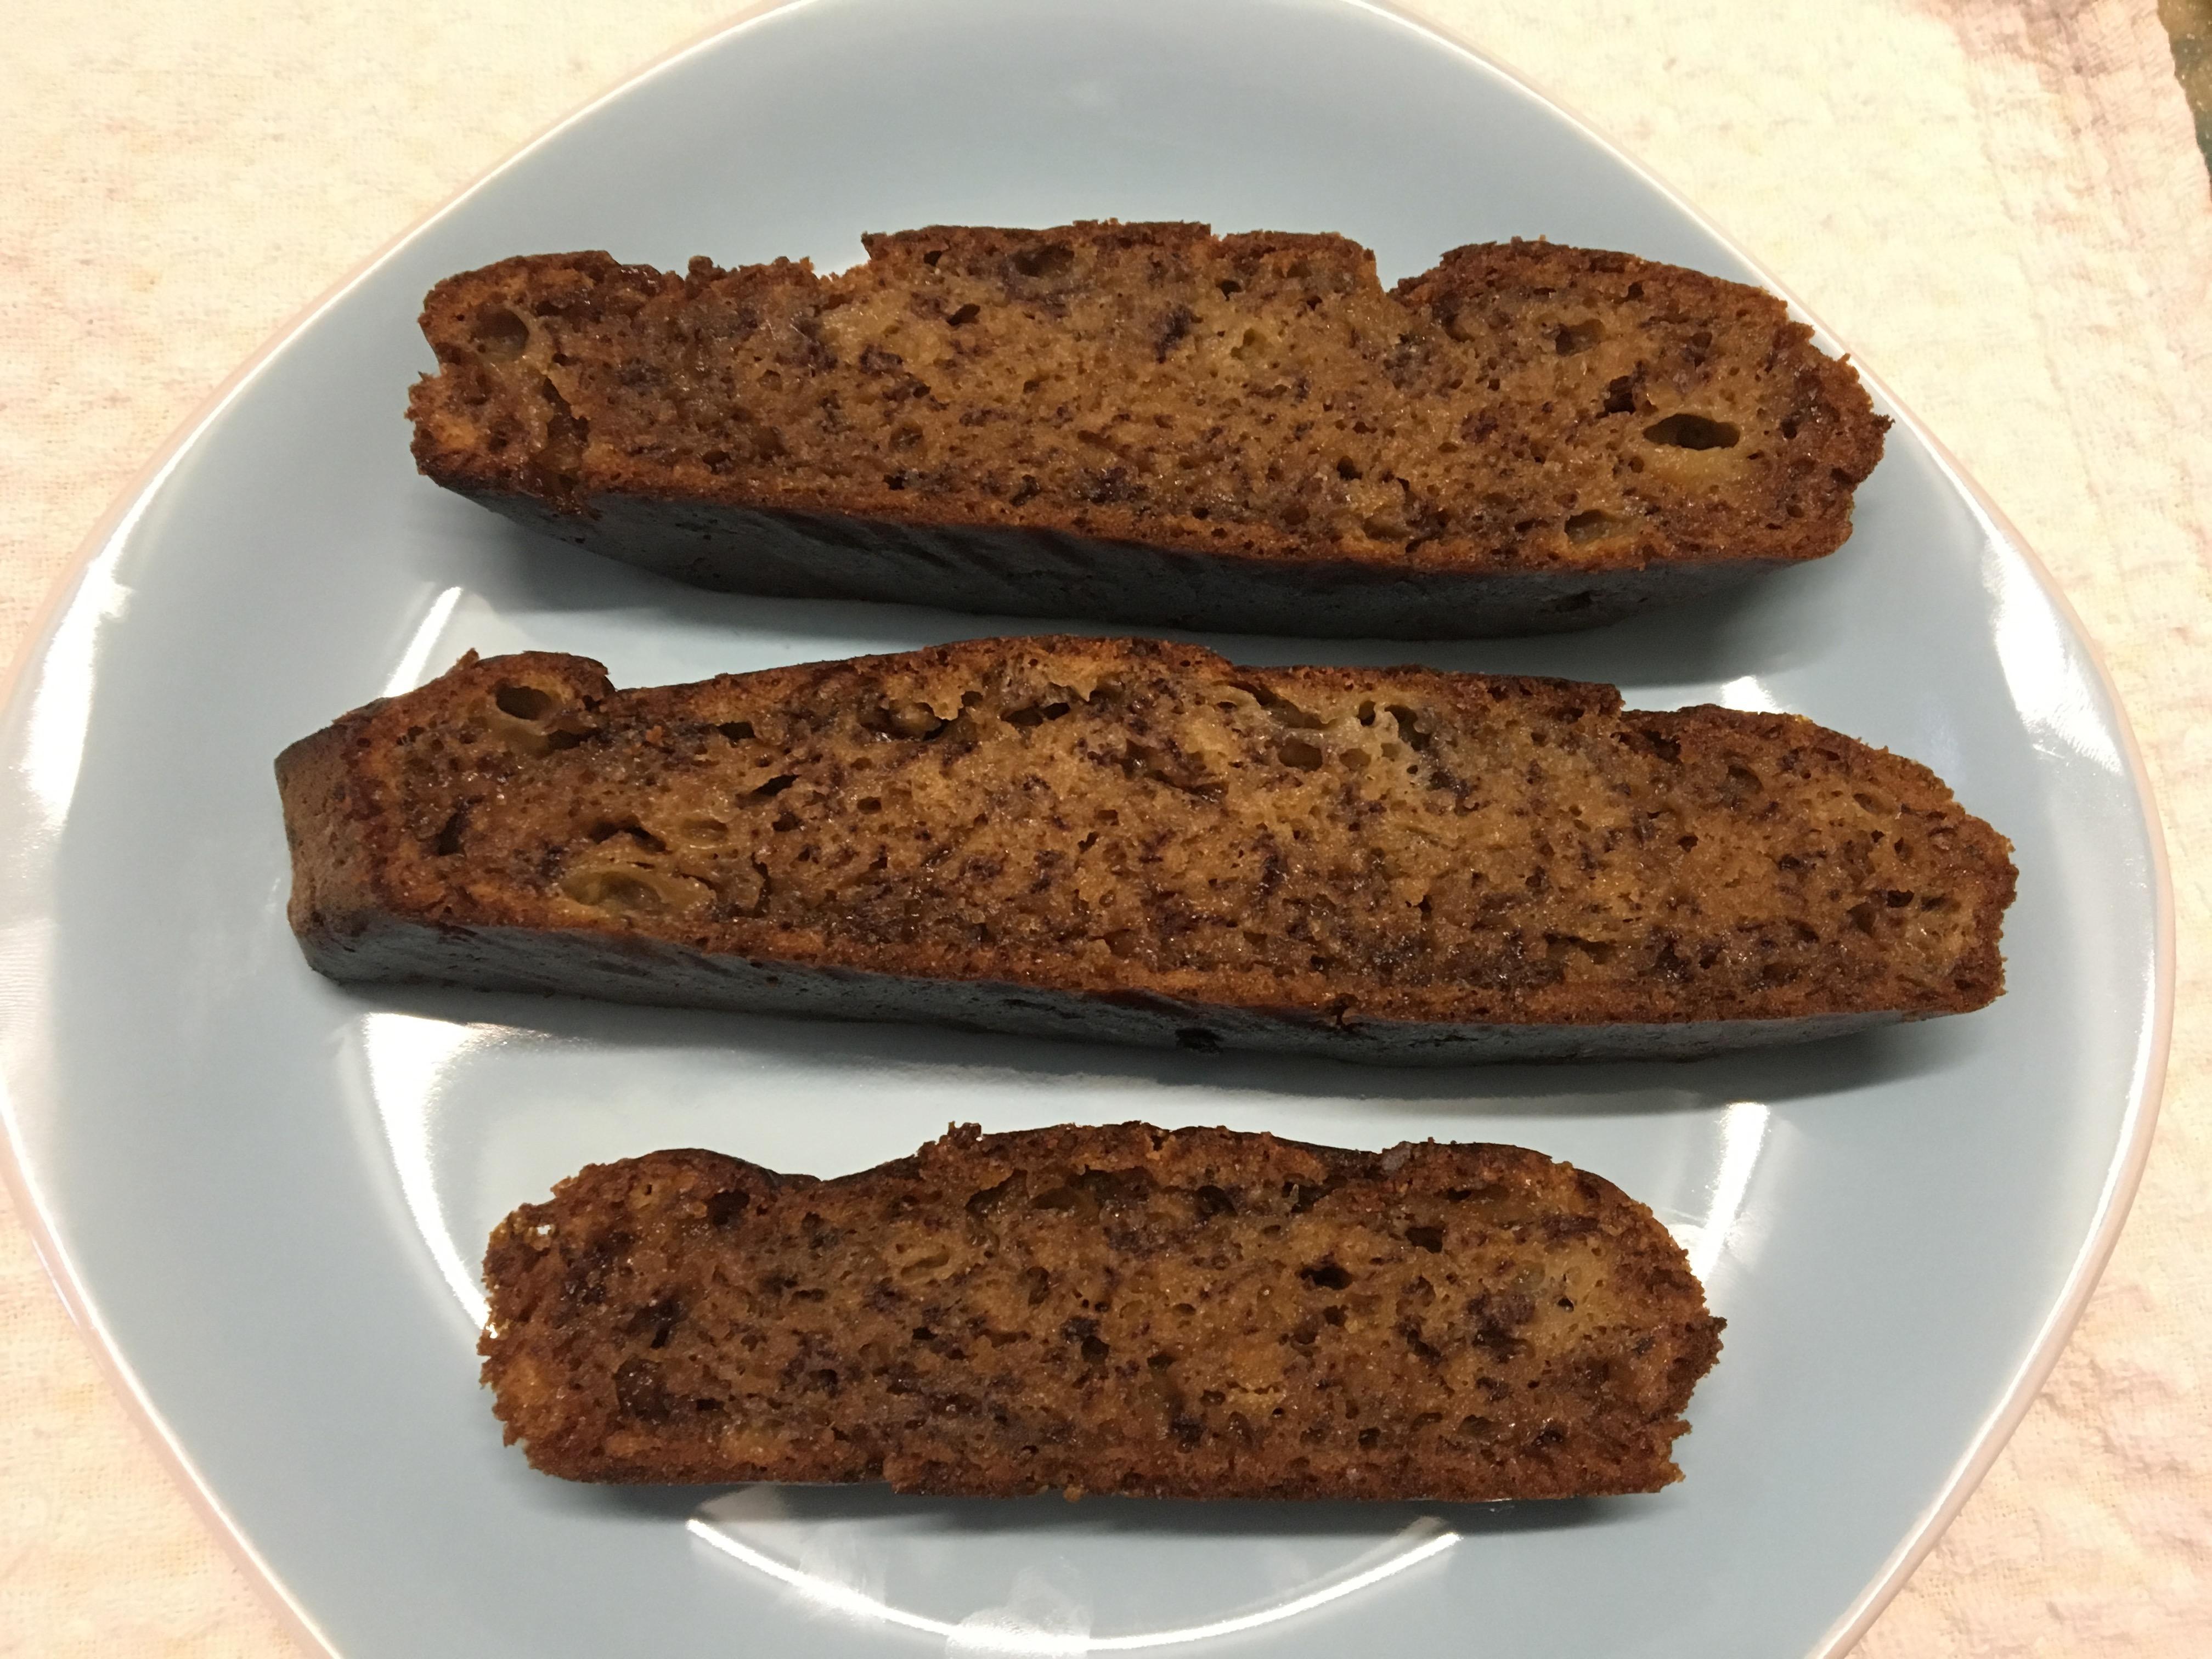 Picture of Gluten-Free Banana Bread